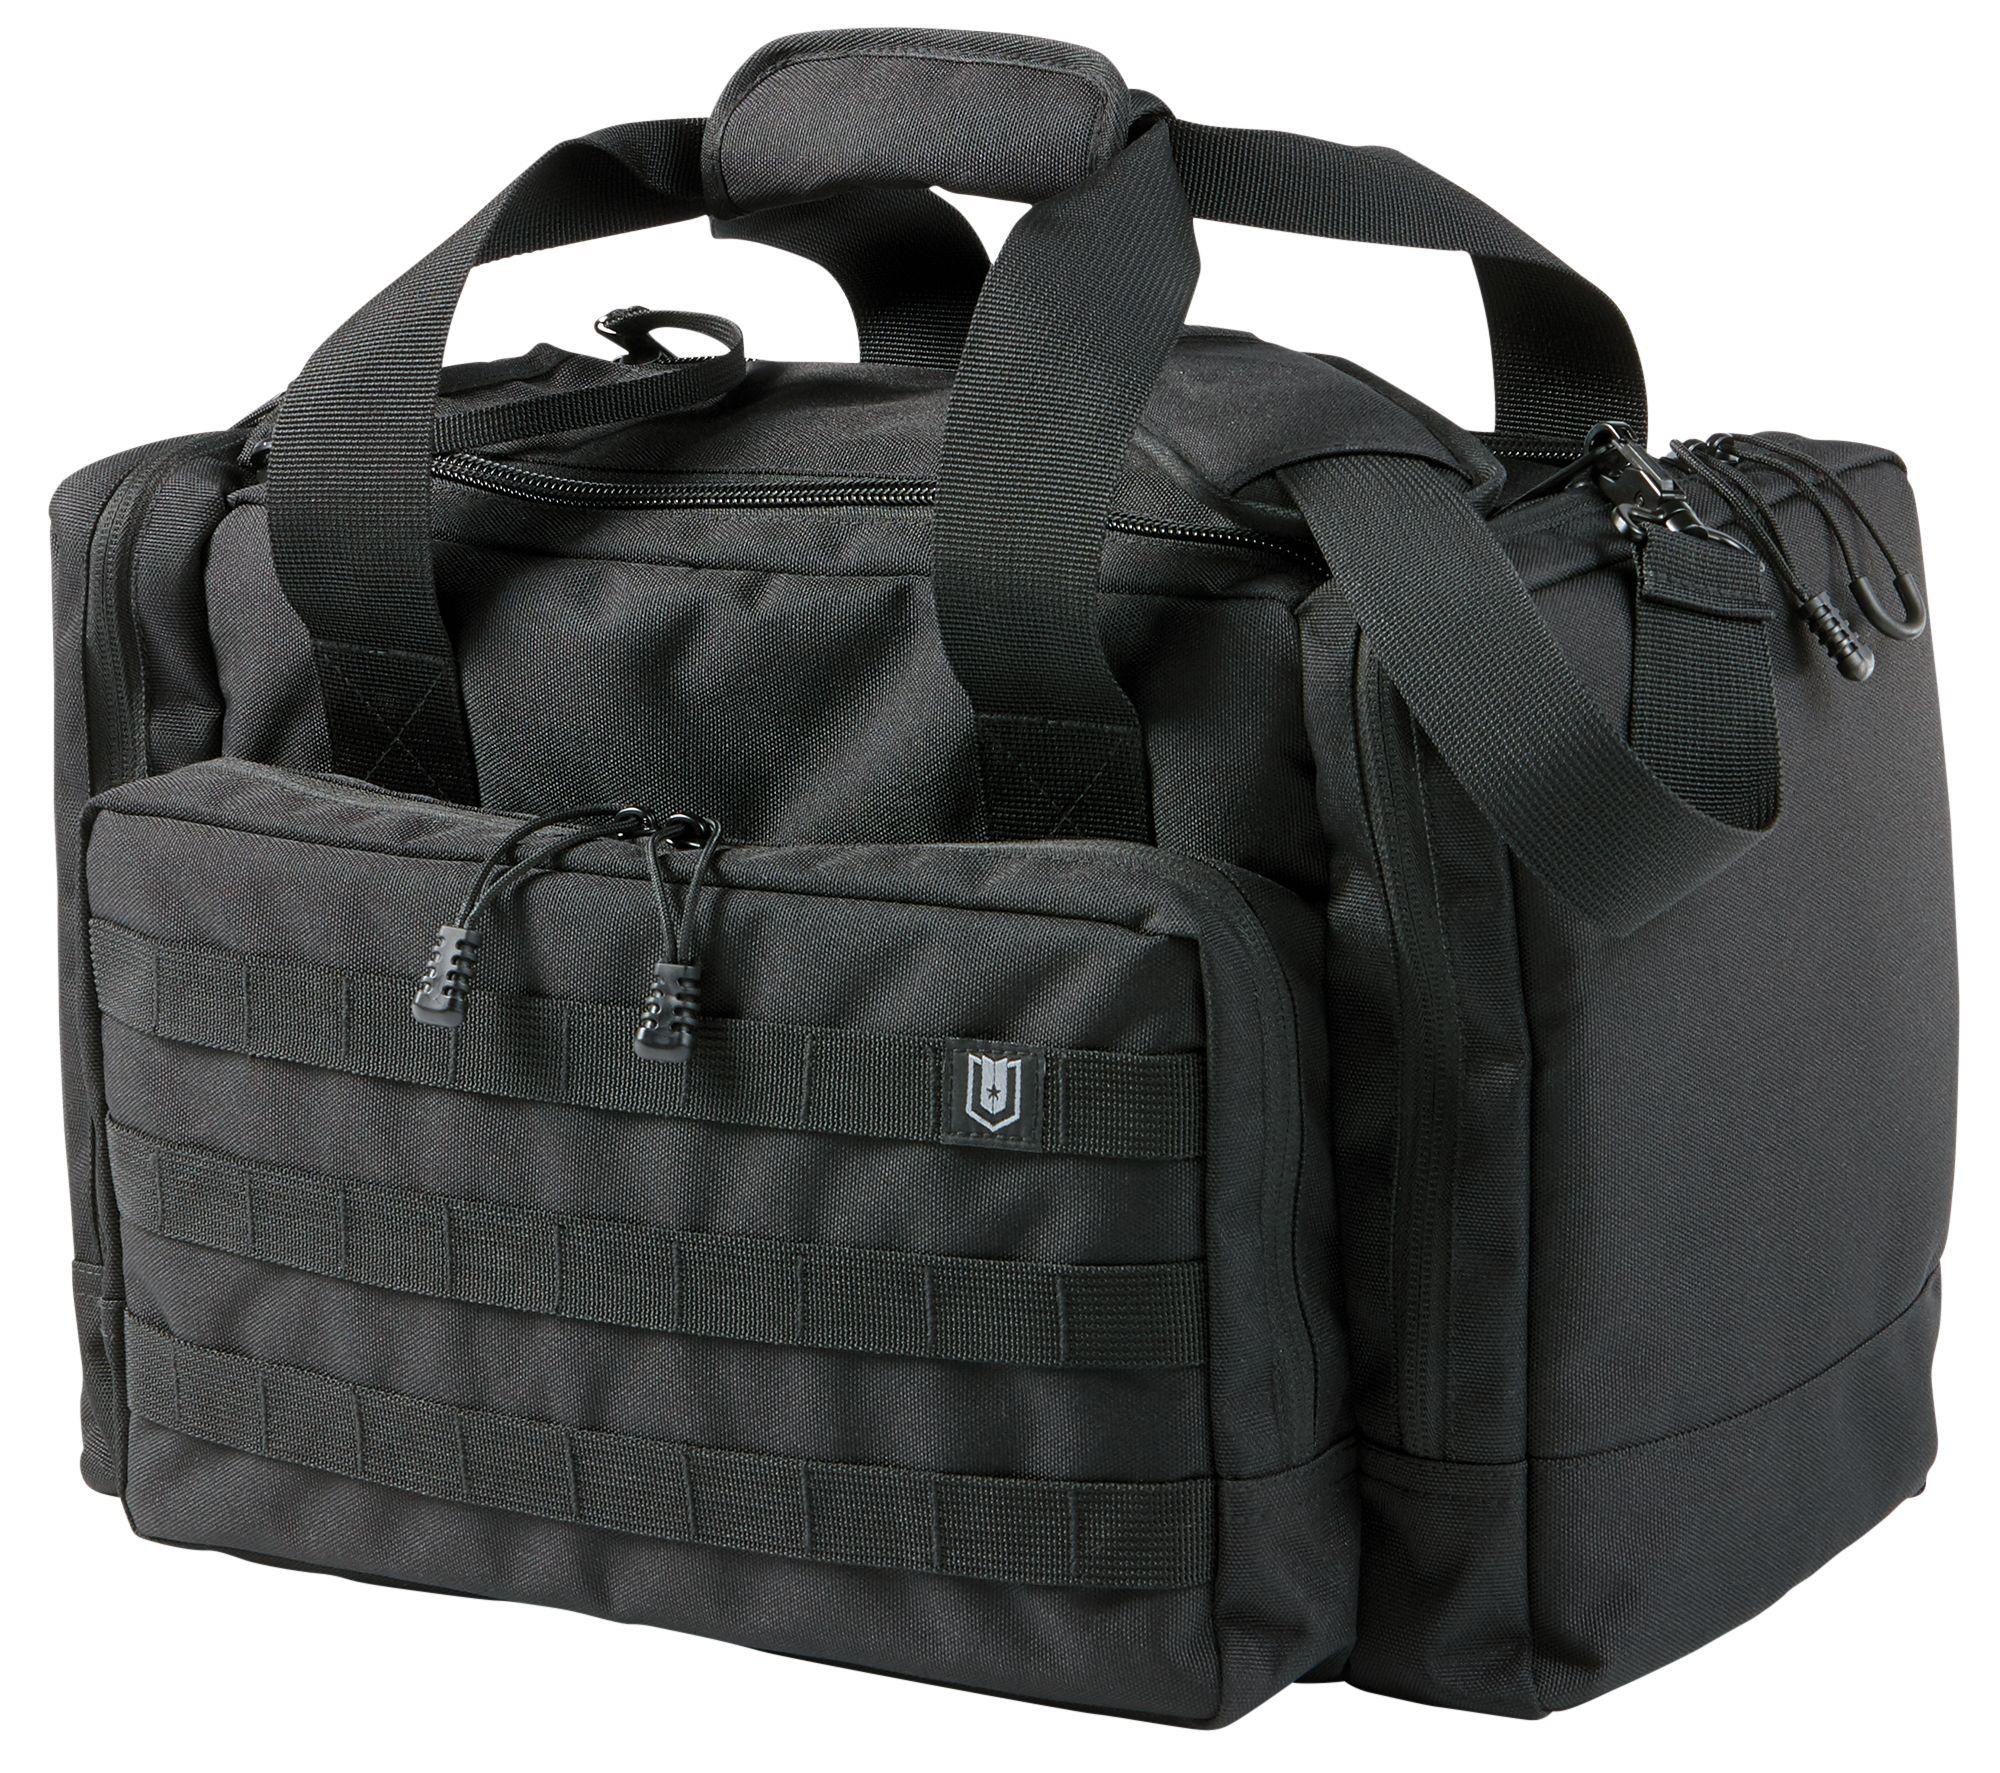 Field & Stream Black Shield Range Bag